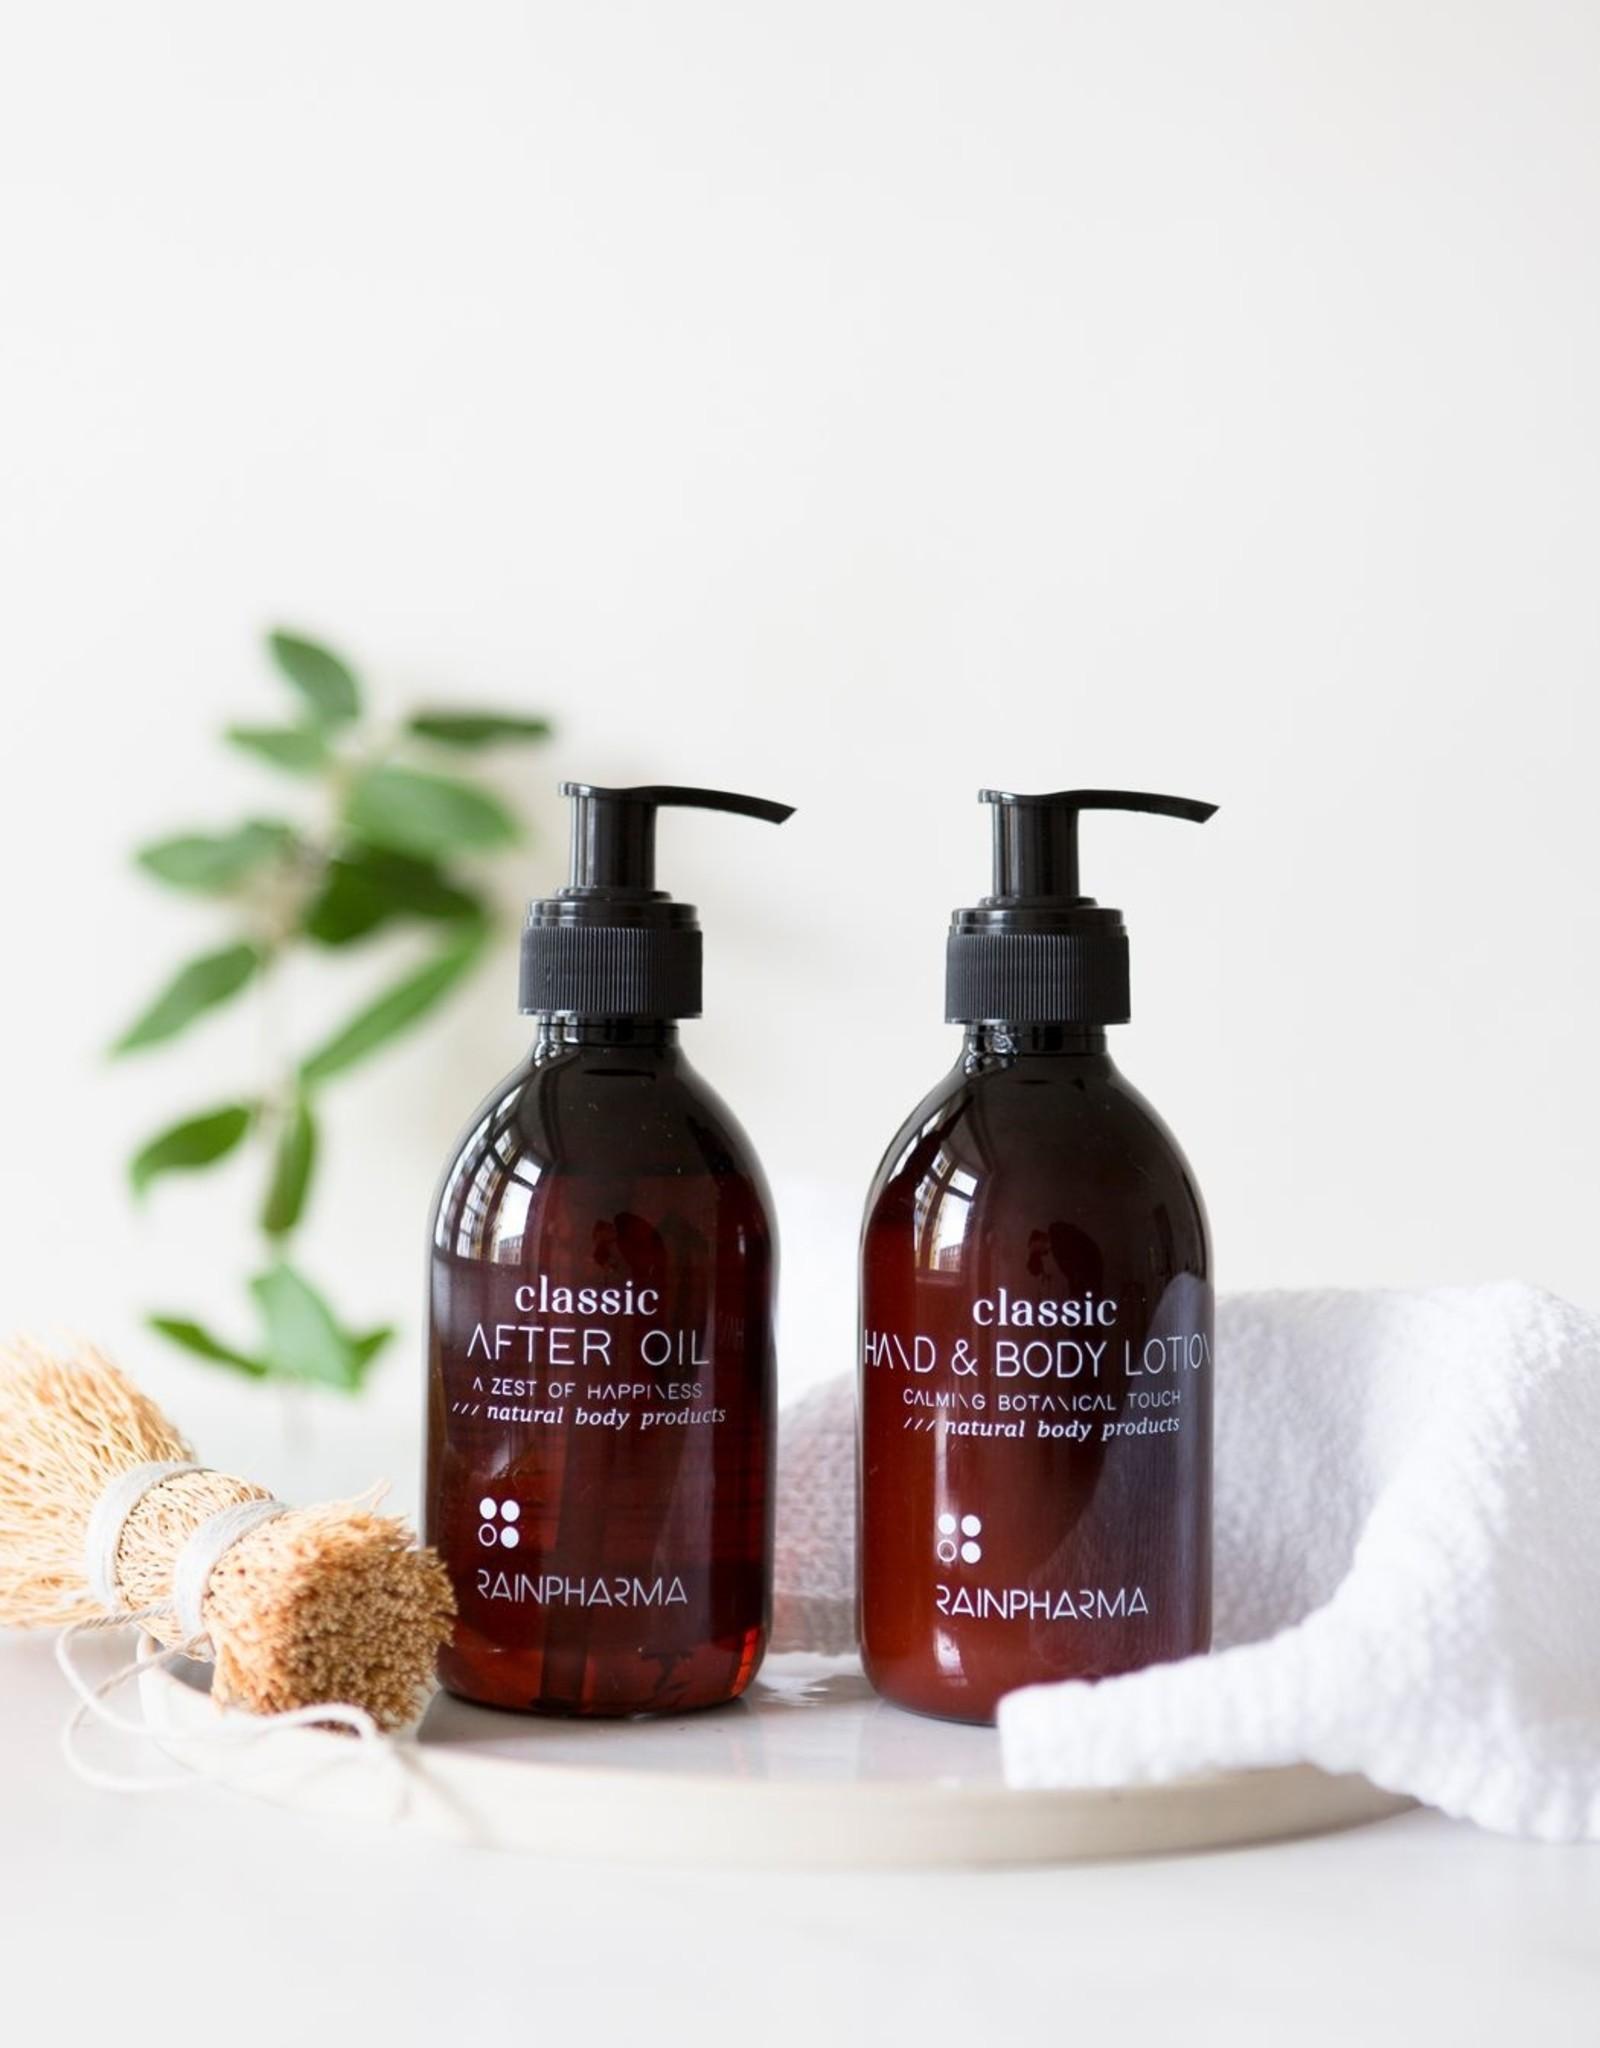 RainPharma Classic Hand & Body Lotion - Calming Botanical Touch 250ml - Rainpharma